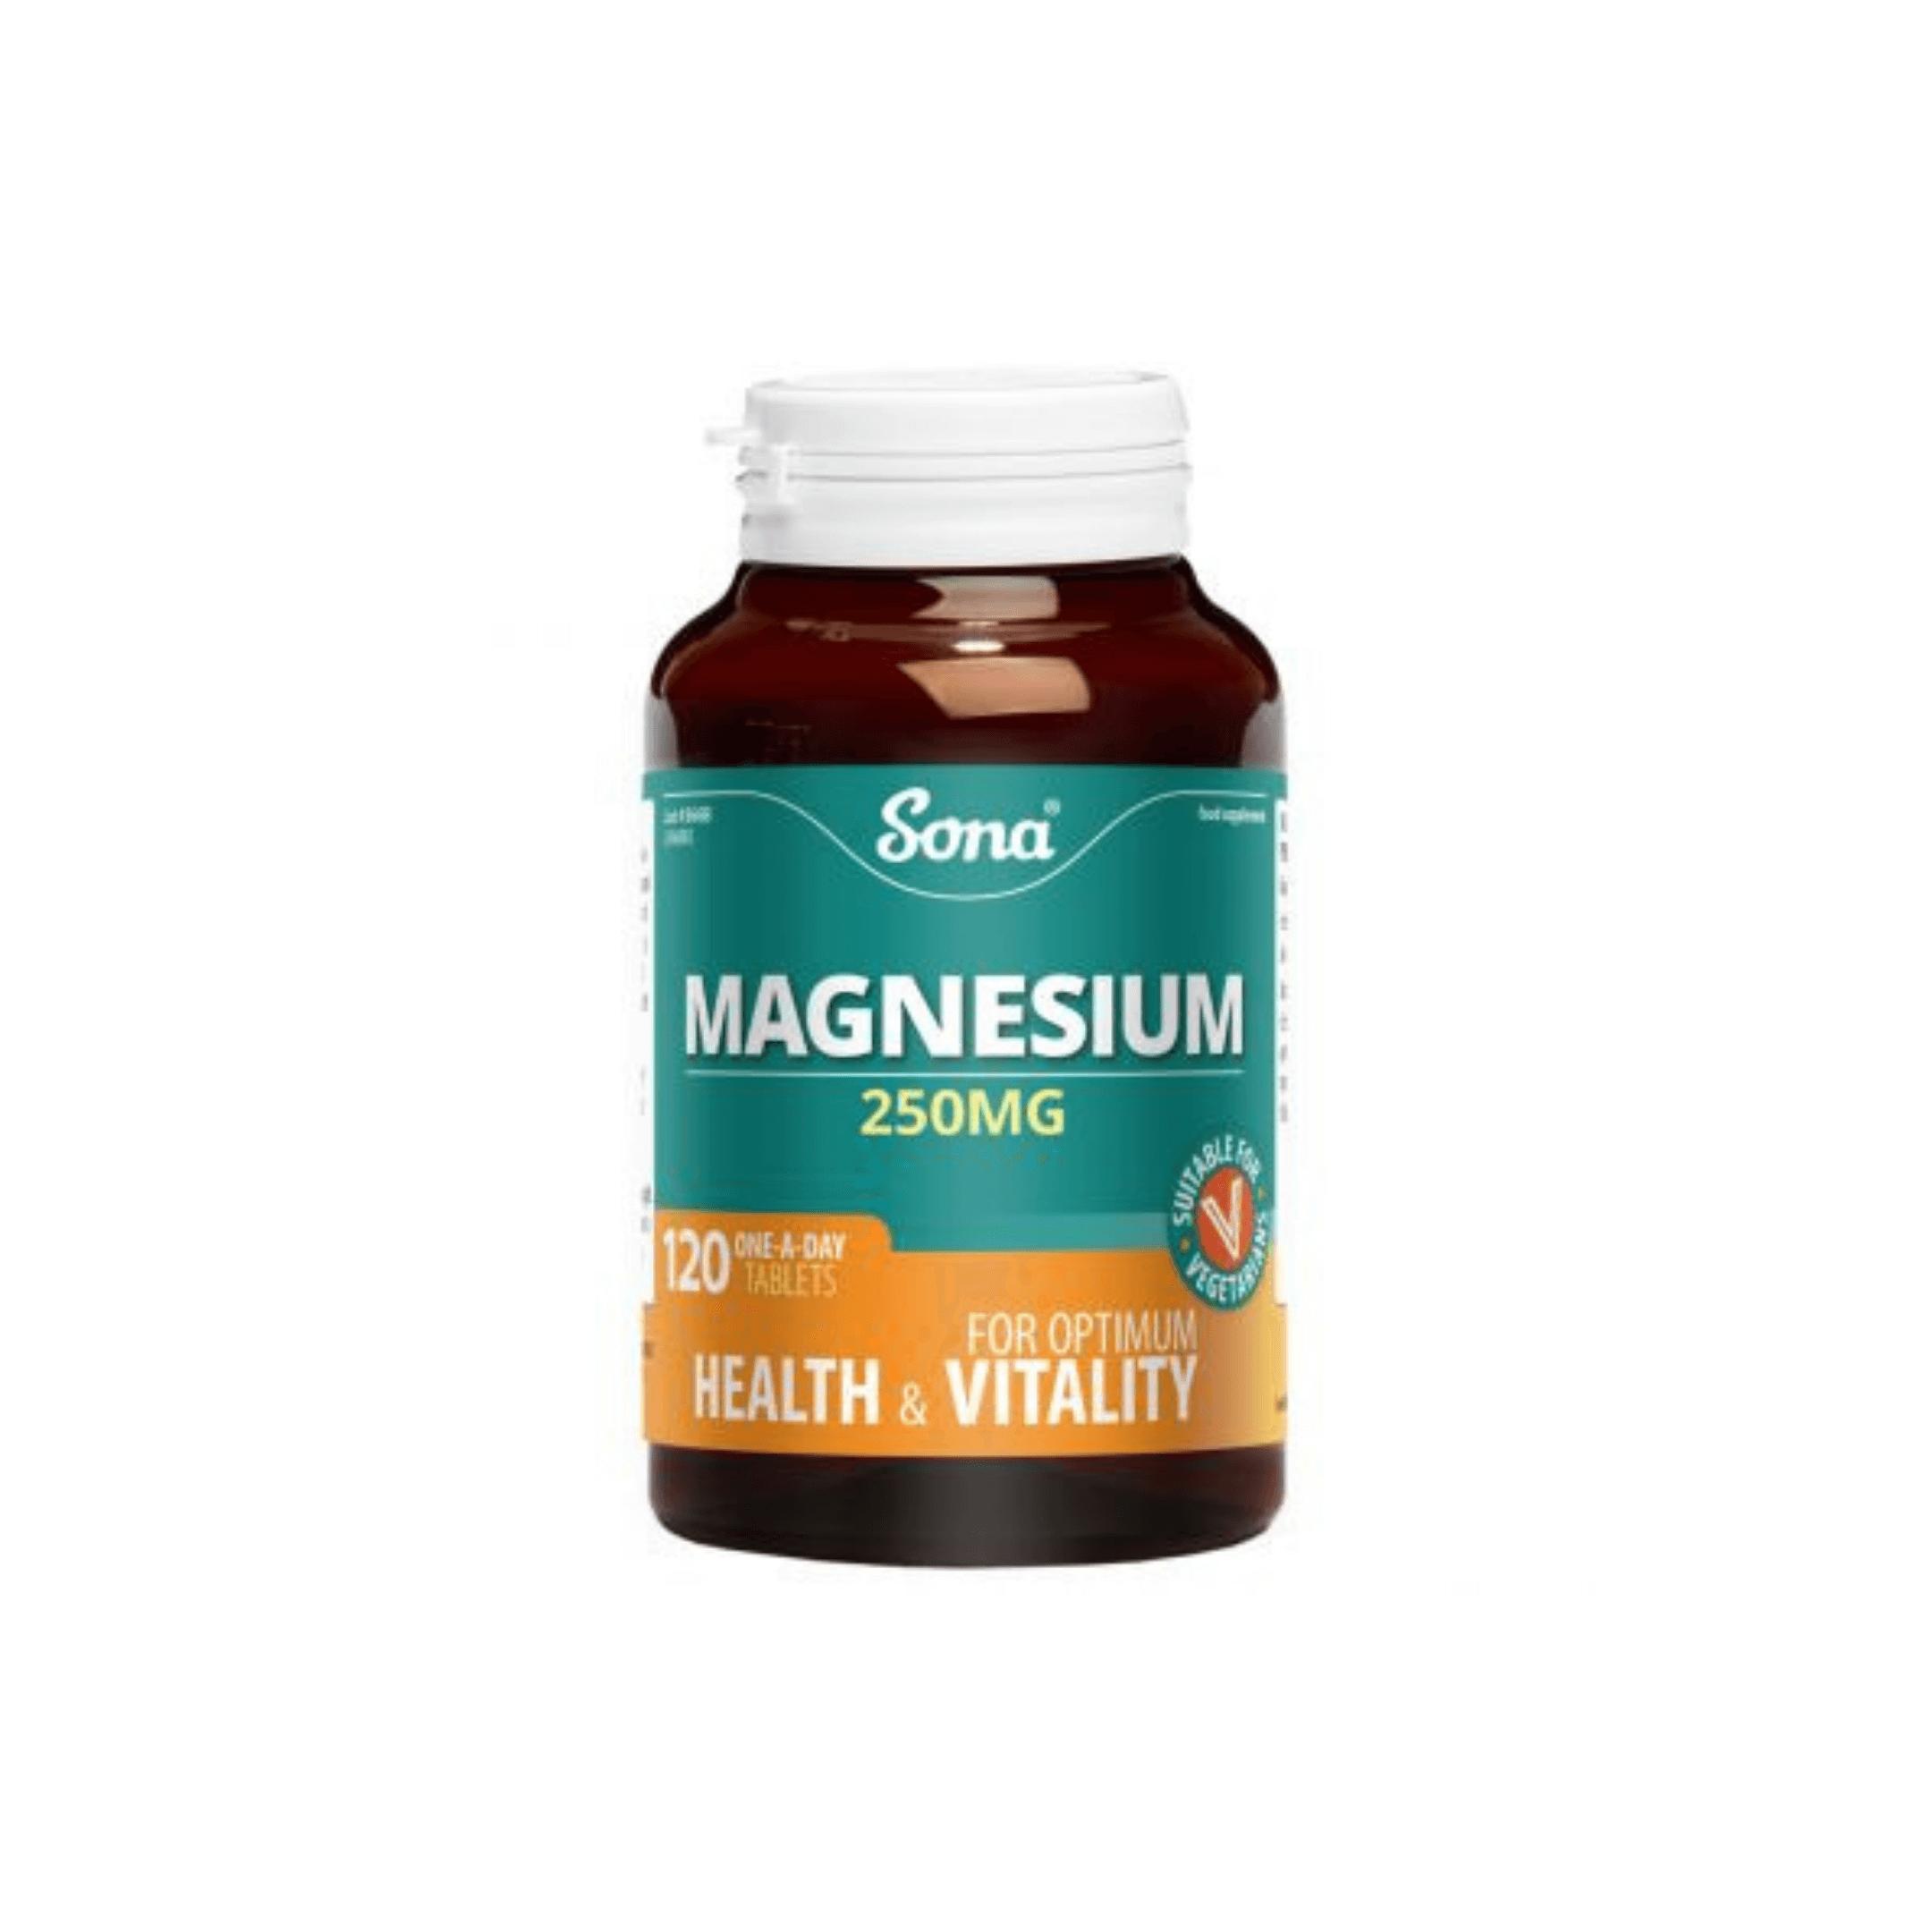 Sona Magnesium Tablets 250mg 120